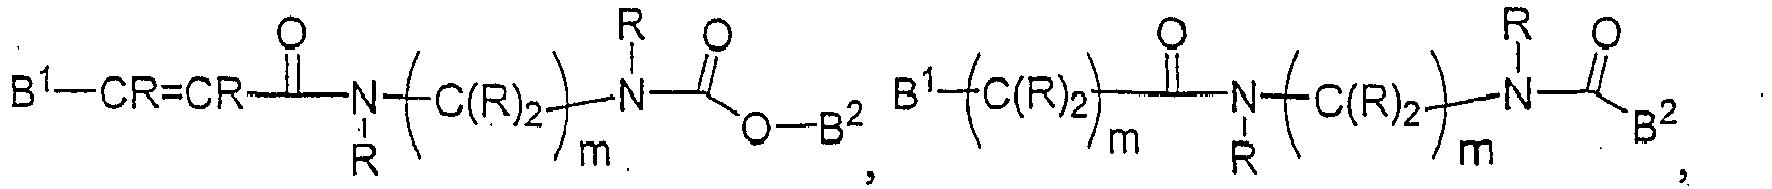 Figure imgb0235